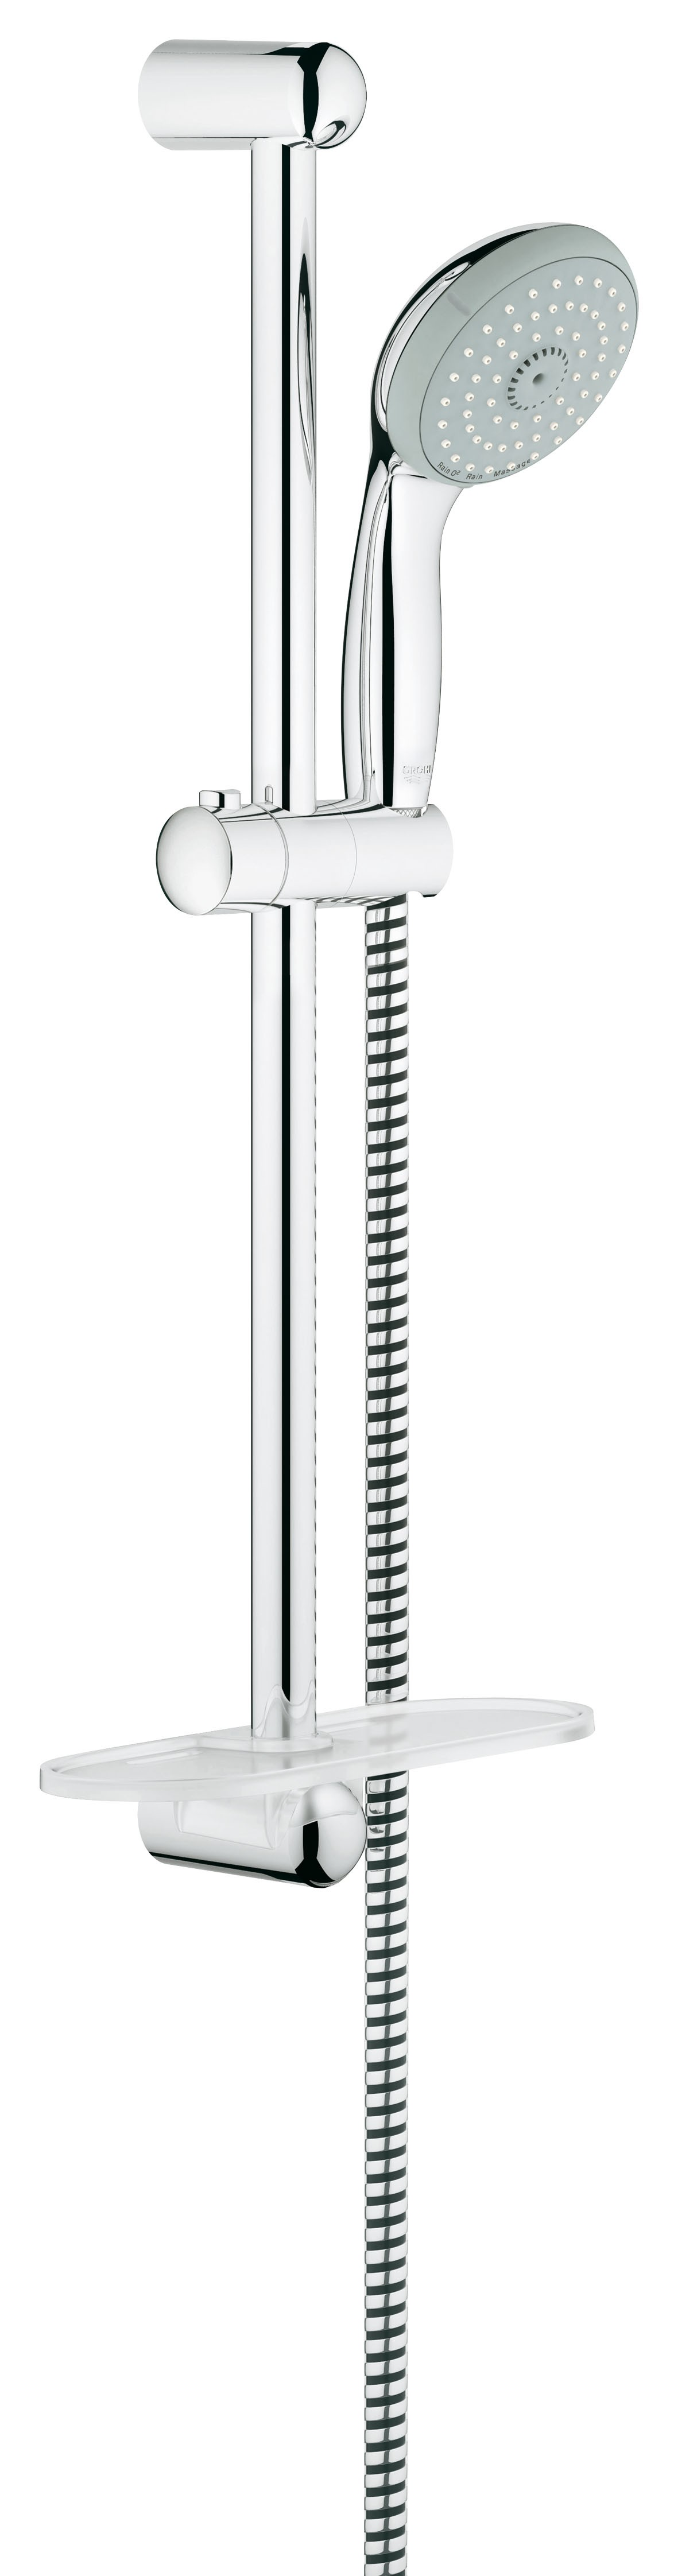 Душевой гарнитур Grohe 27927000 Tempesta Classic (ручной душ, штанга 600 мм, шланг 1750 мм), хром